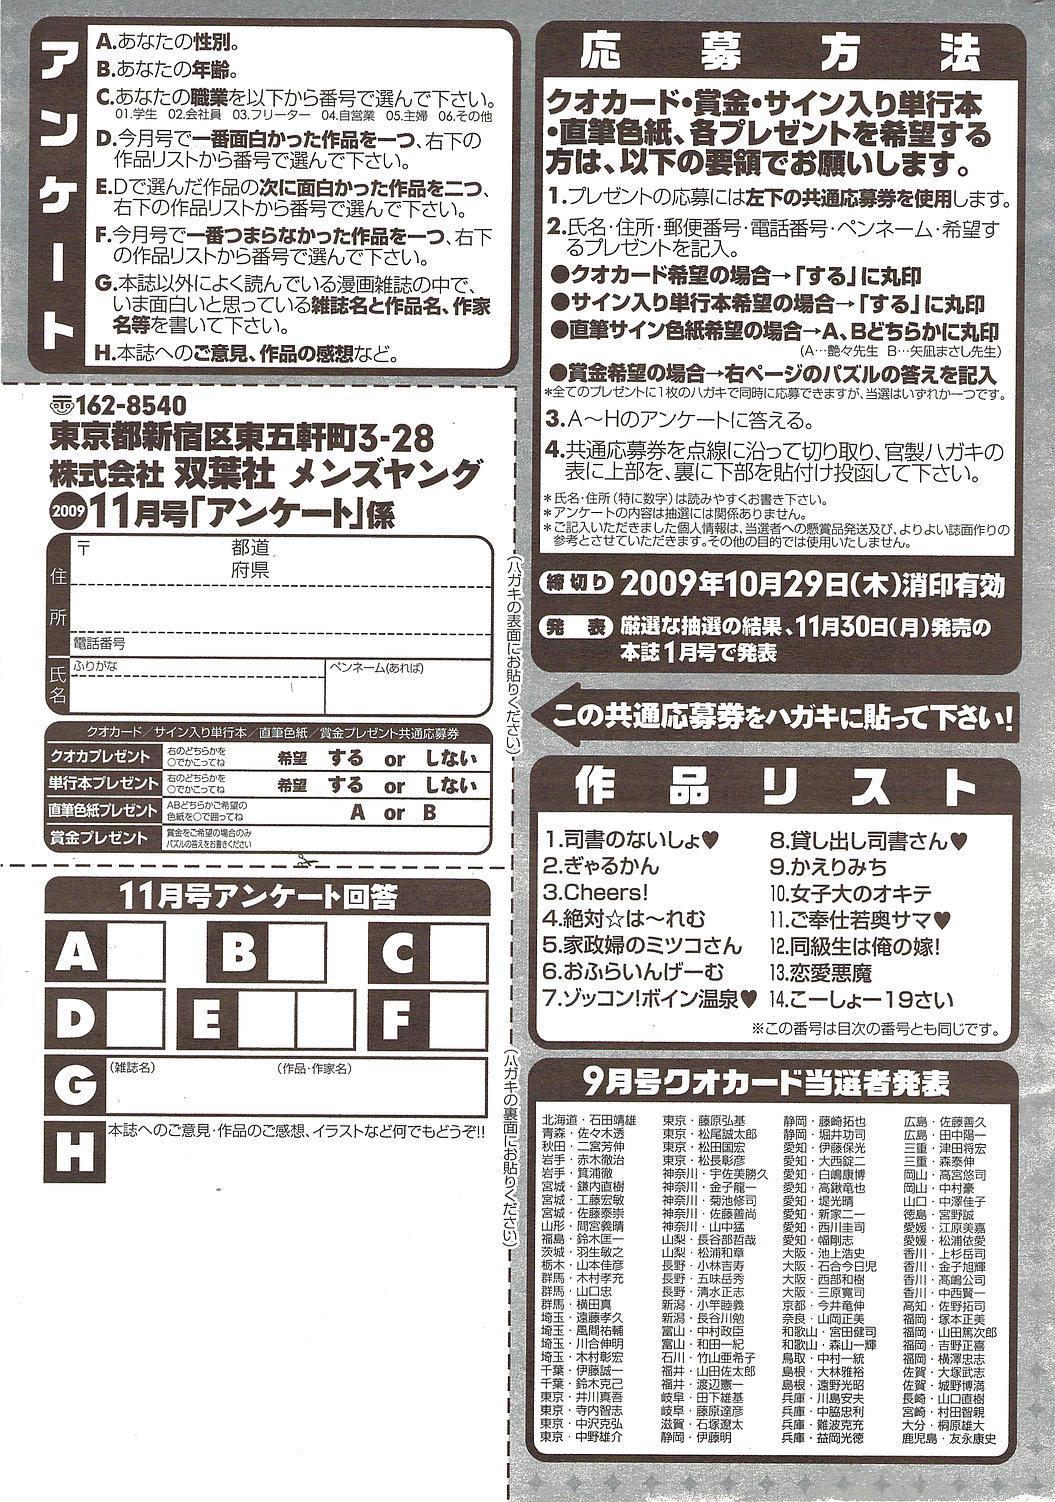 COMIC Men's Young 2009-11 254